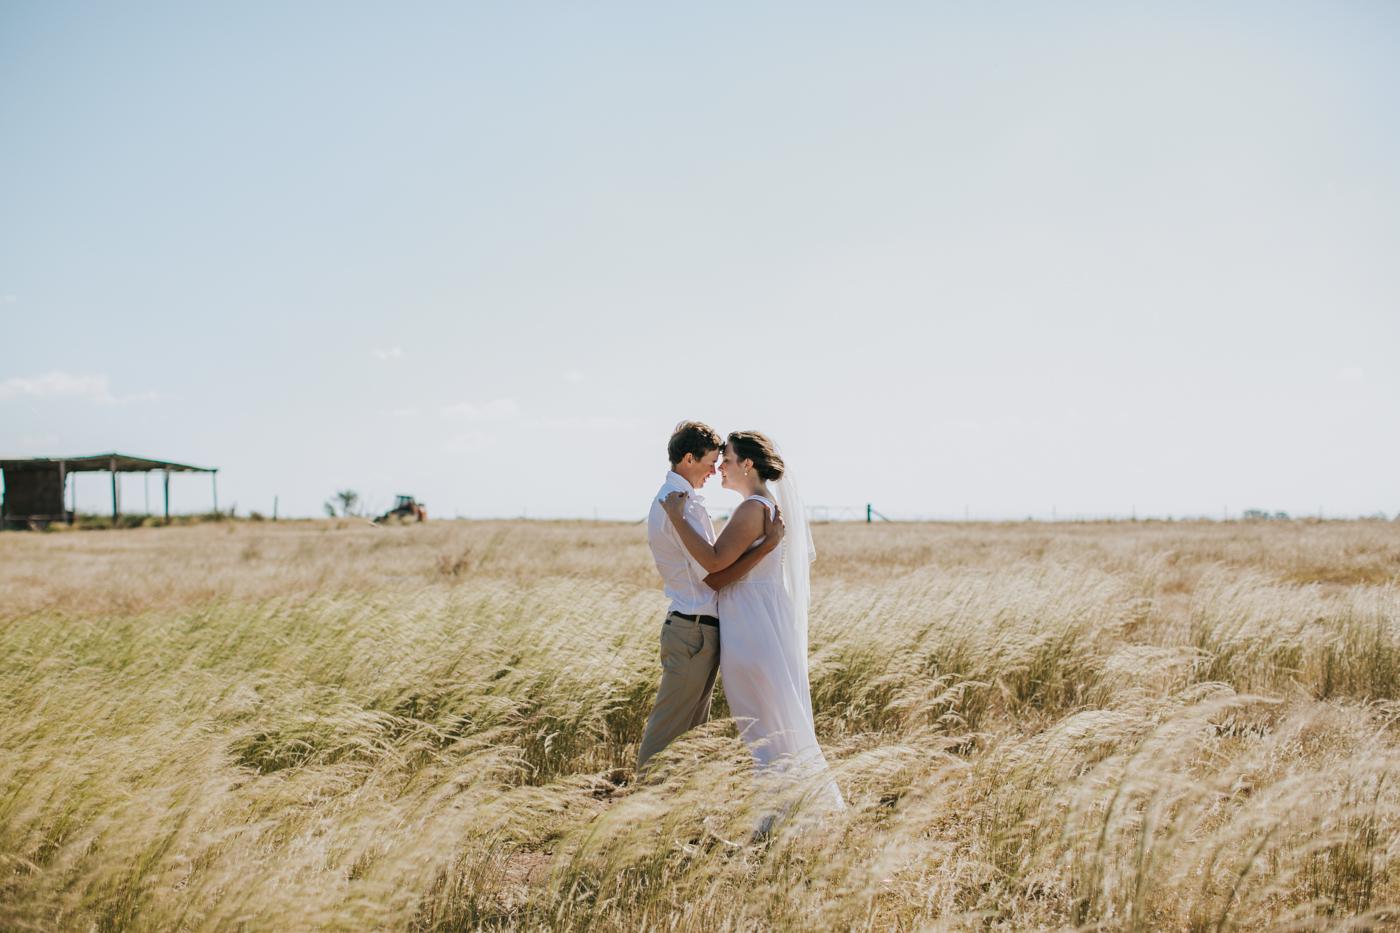 Nicolle & Jacob - Dubbo Wedding - Country Australia - Samantha Heather Photography-163.jpg